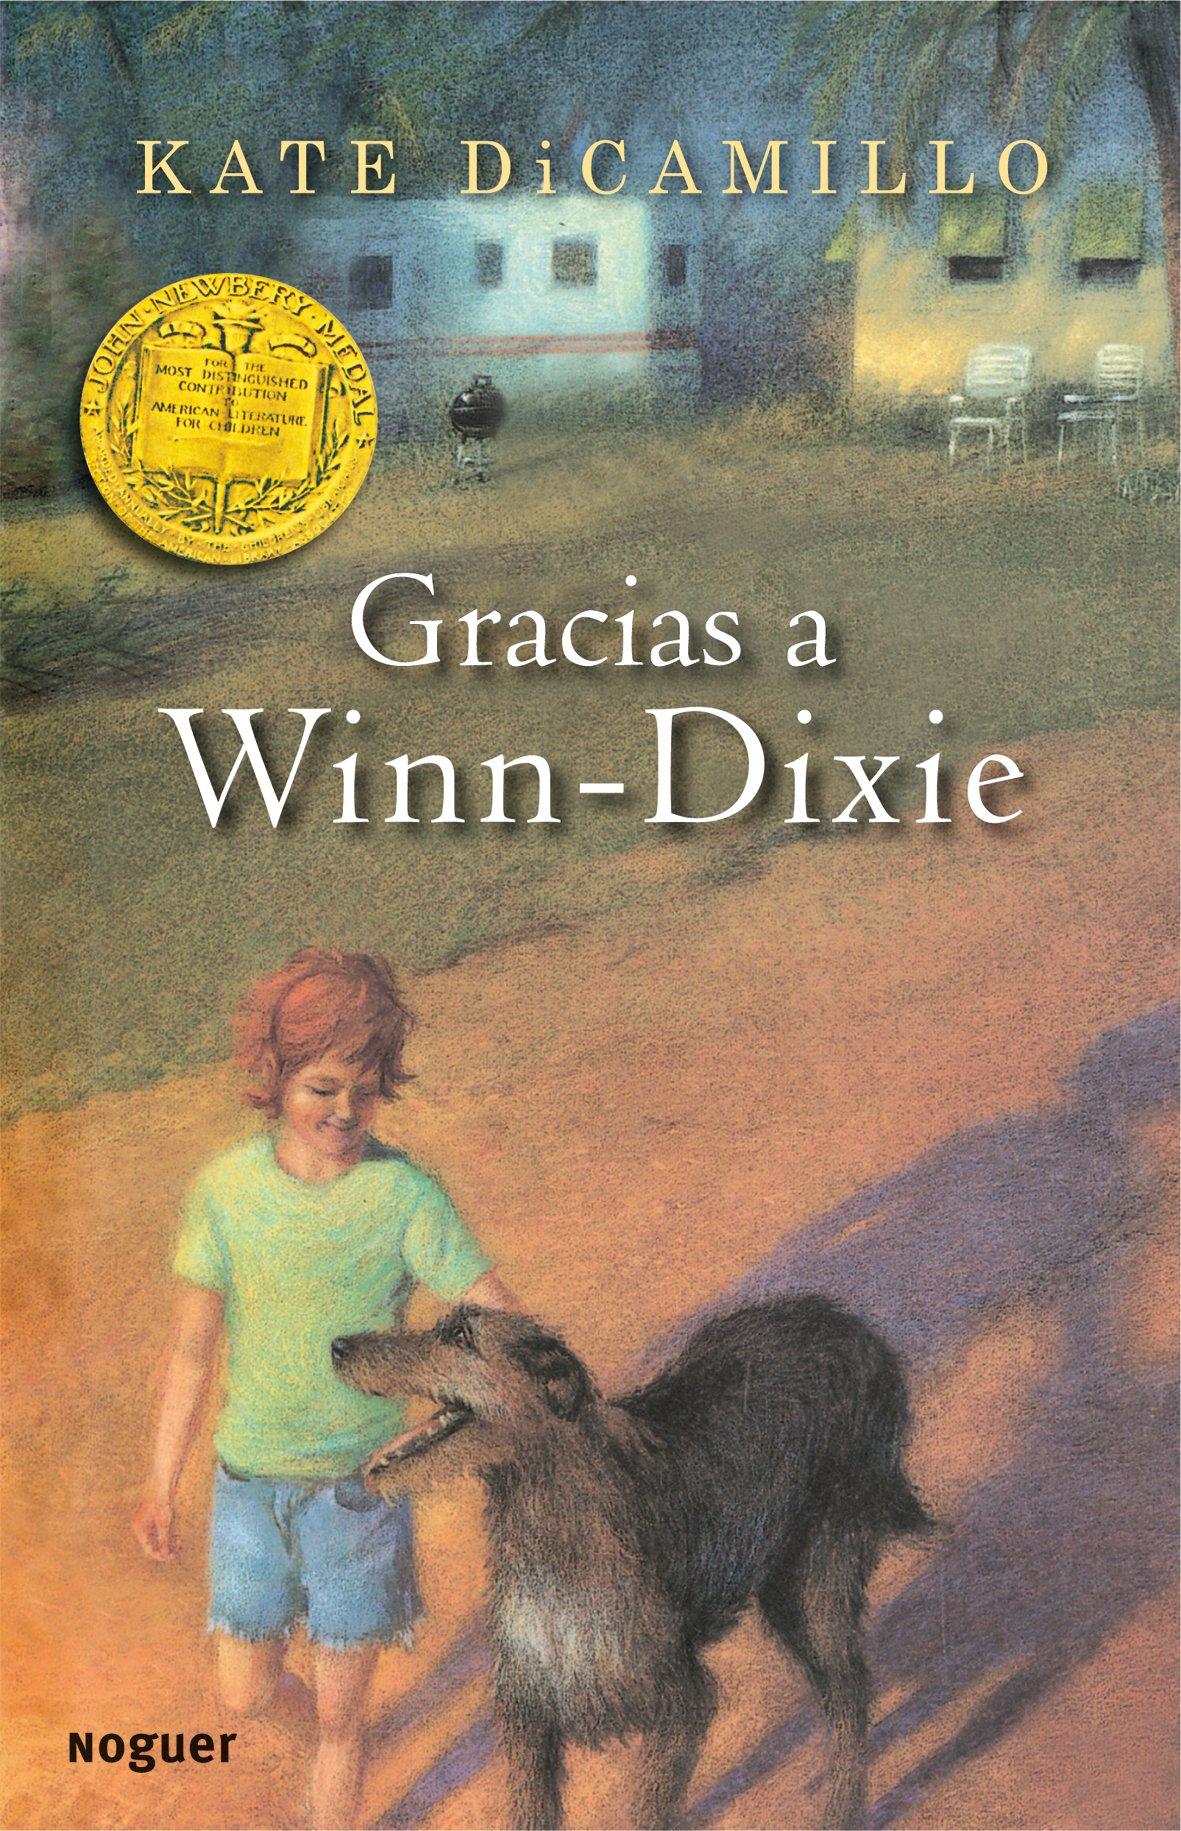 Gracias a Winn-Dixie (Noguer Infantil): Amazon.es: Kate DiCamillo, Alberto Jiménez Rioja: Libros